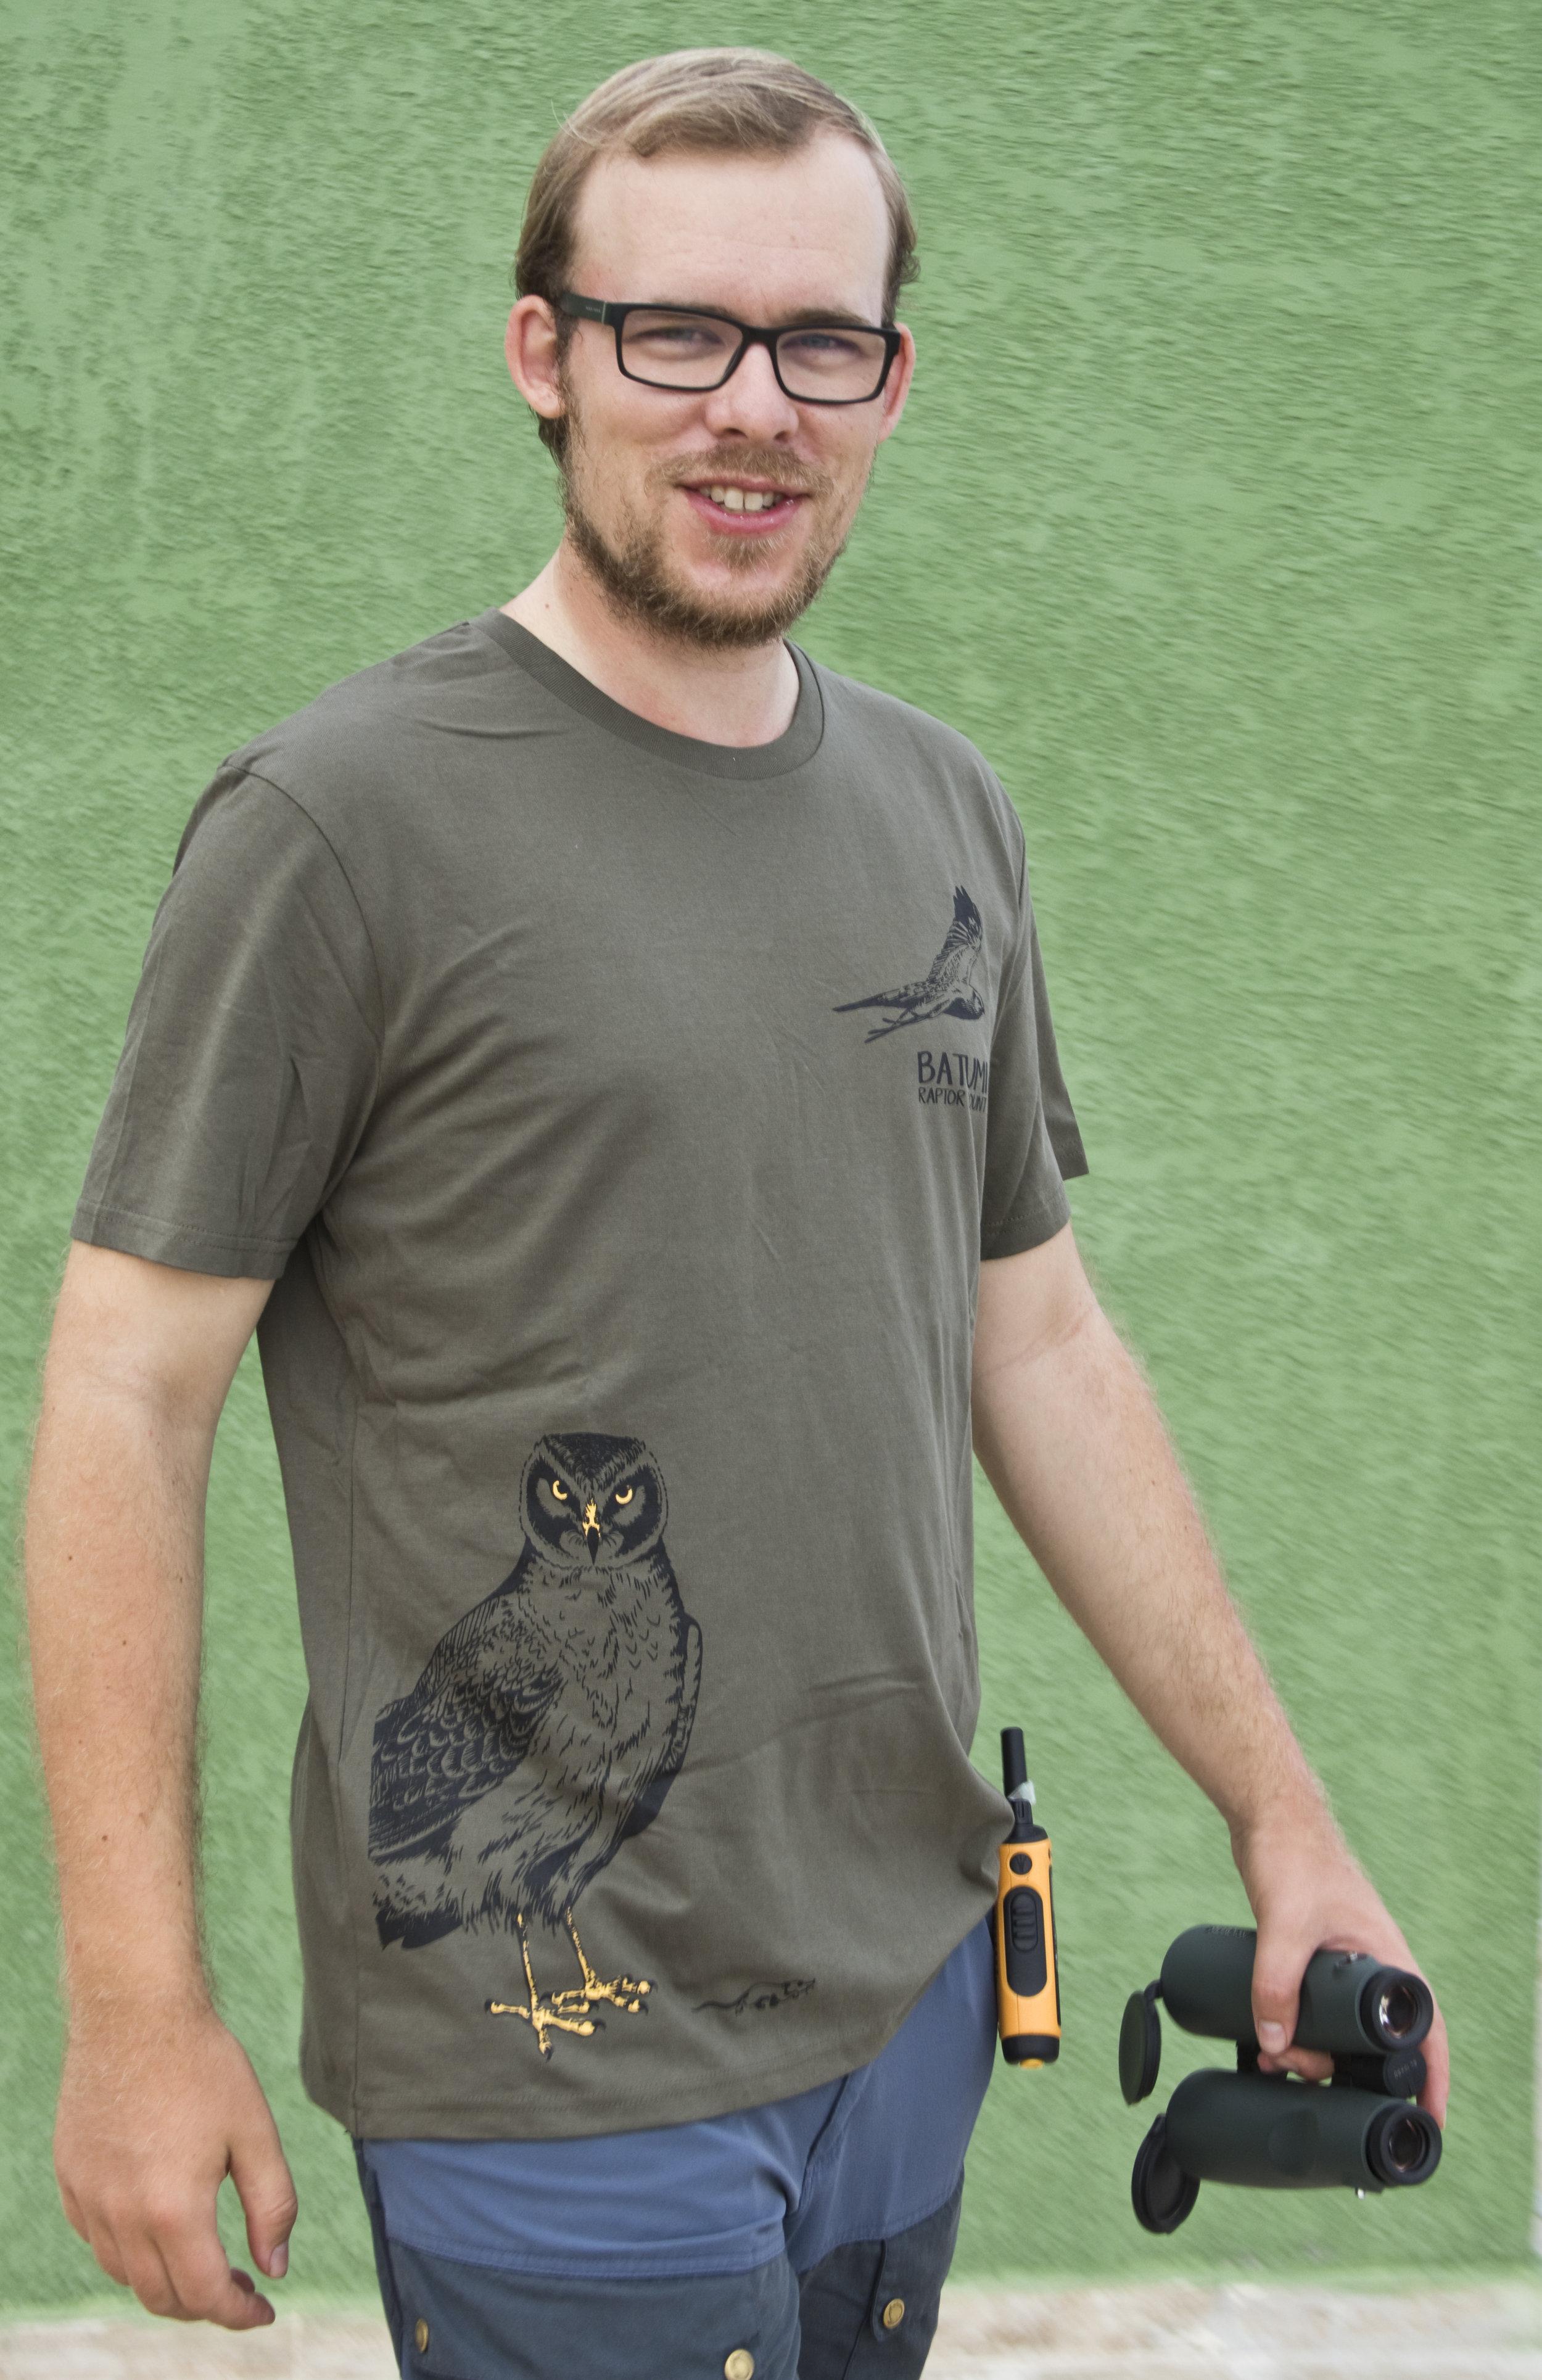 The new BRC shirt. Photo by Triin Kaasiku.